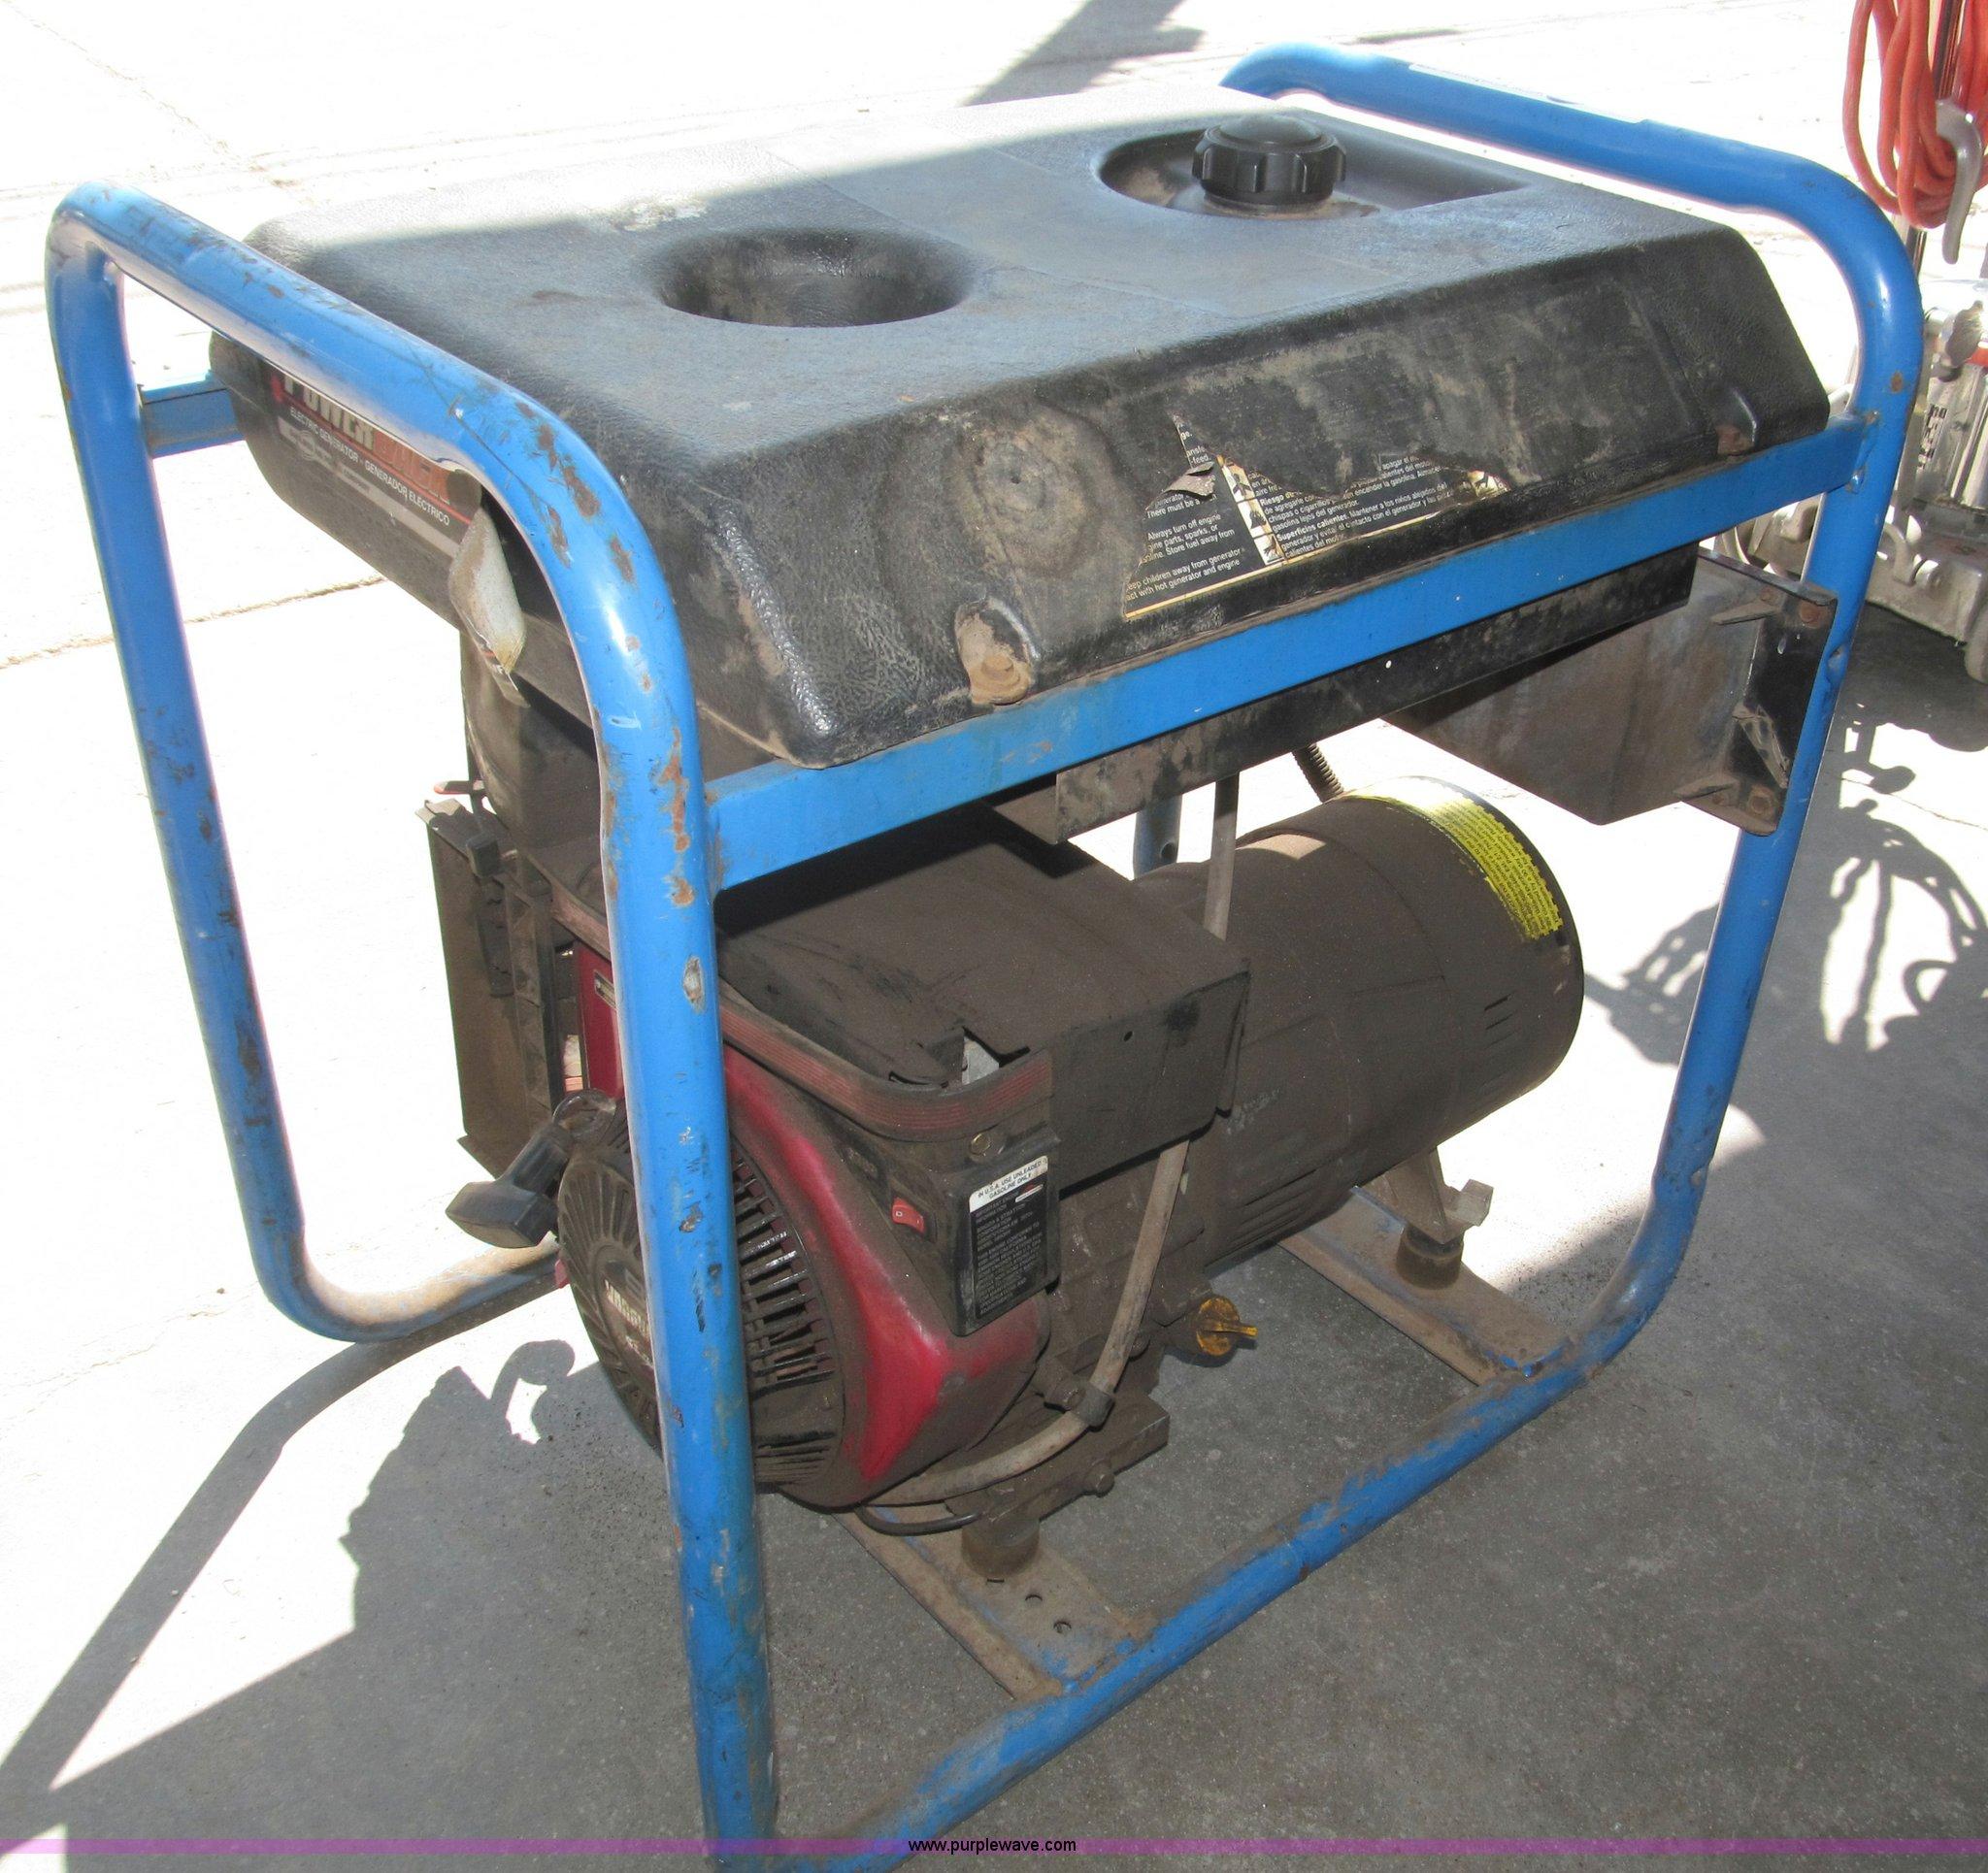 DevilBiss Powerback 5 000 watt generator Item K9525